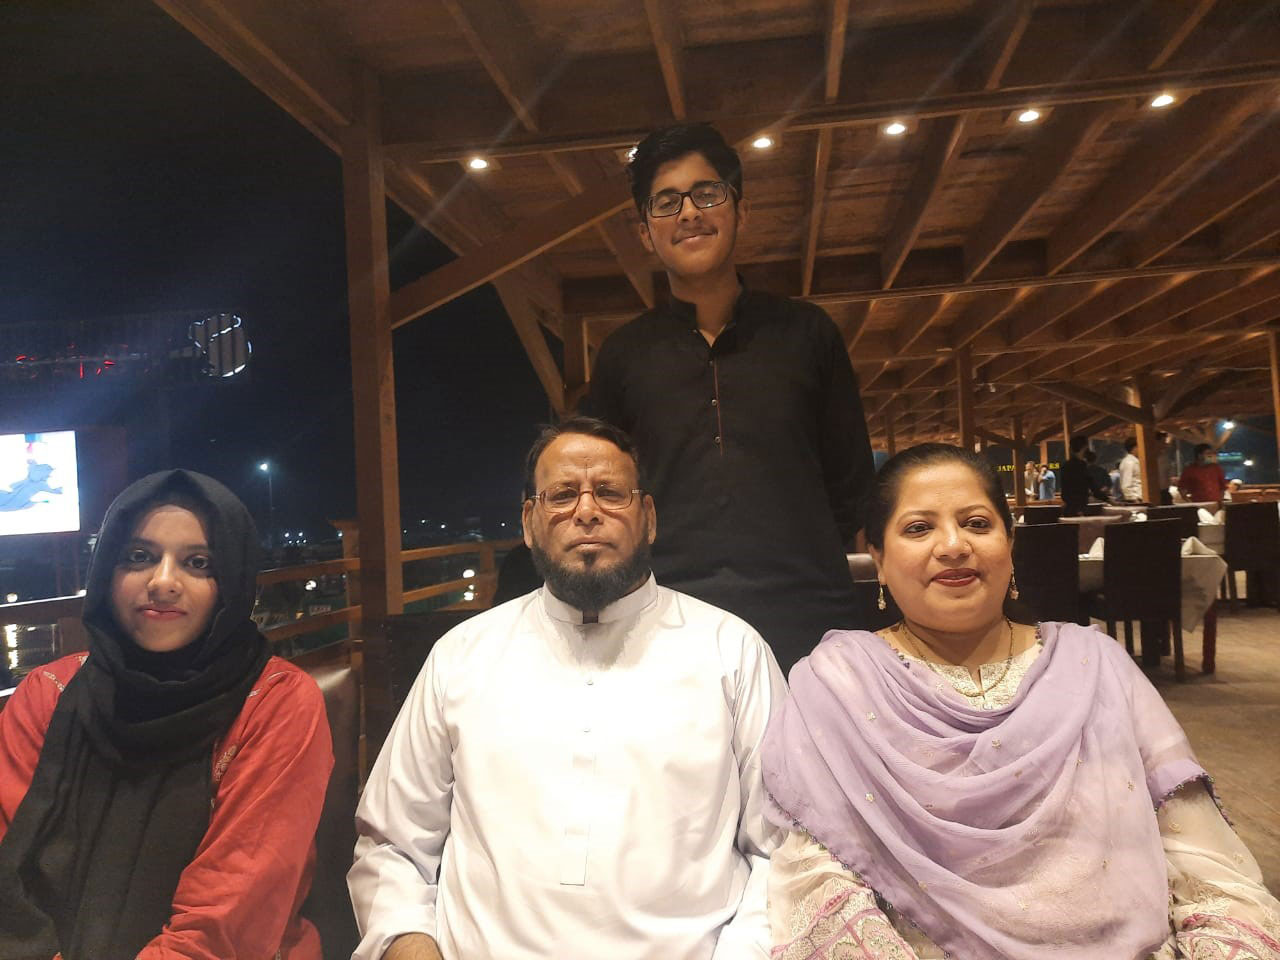 Standing: Habib Ur Rehman | Sitting: Mariam A. Rehman, Dr Ata Ur Rehman, Dr. Kiran A. Rehman